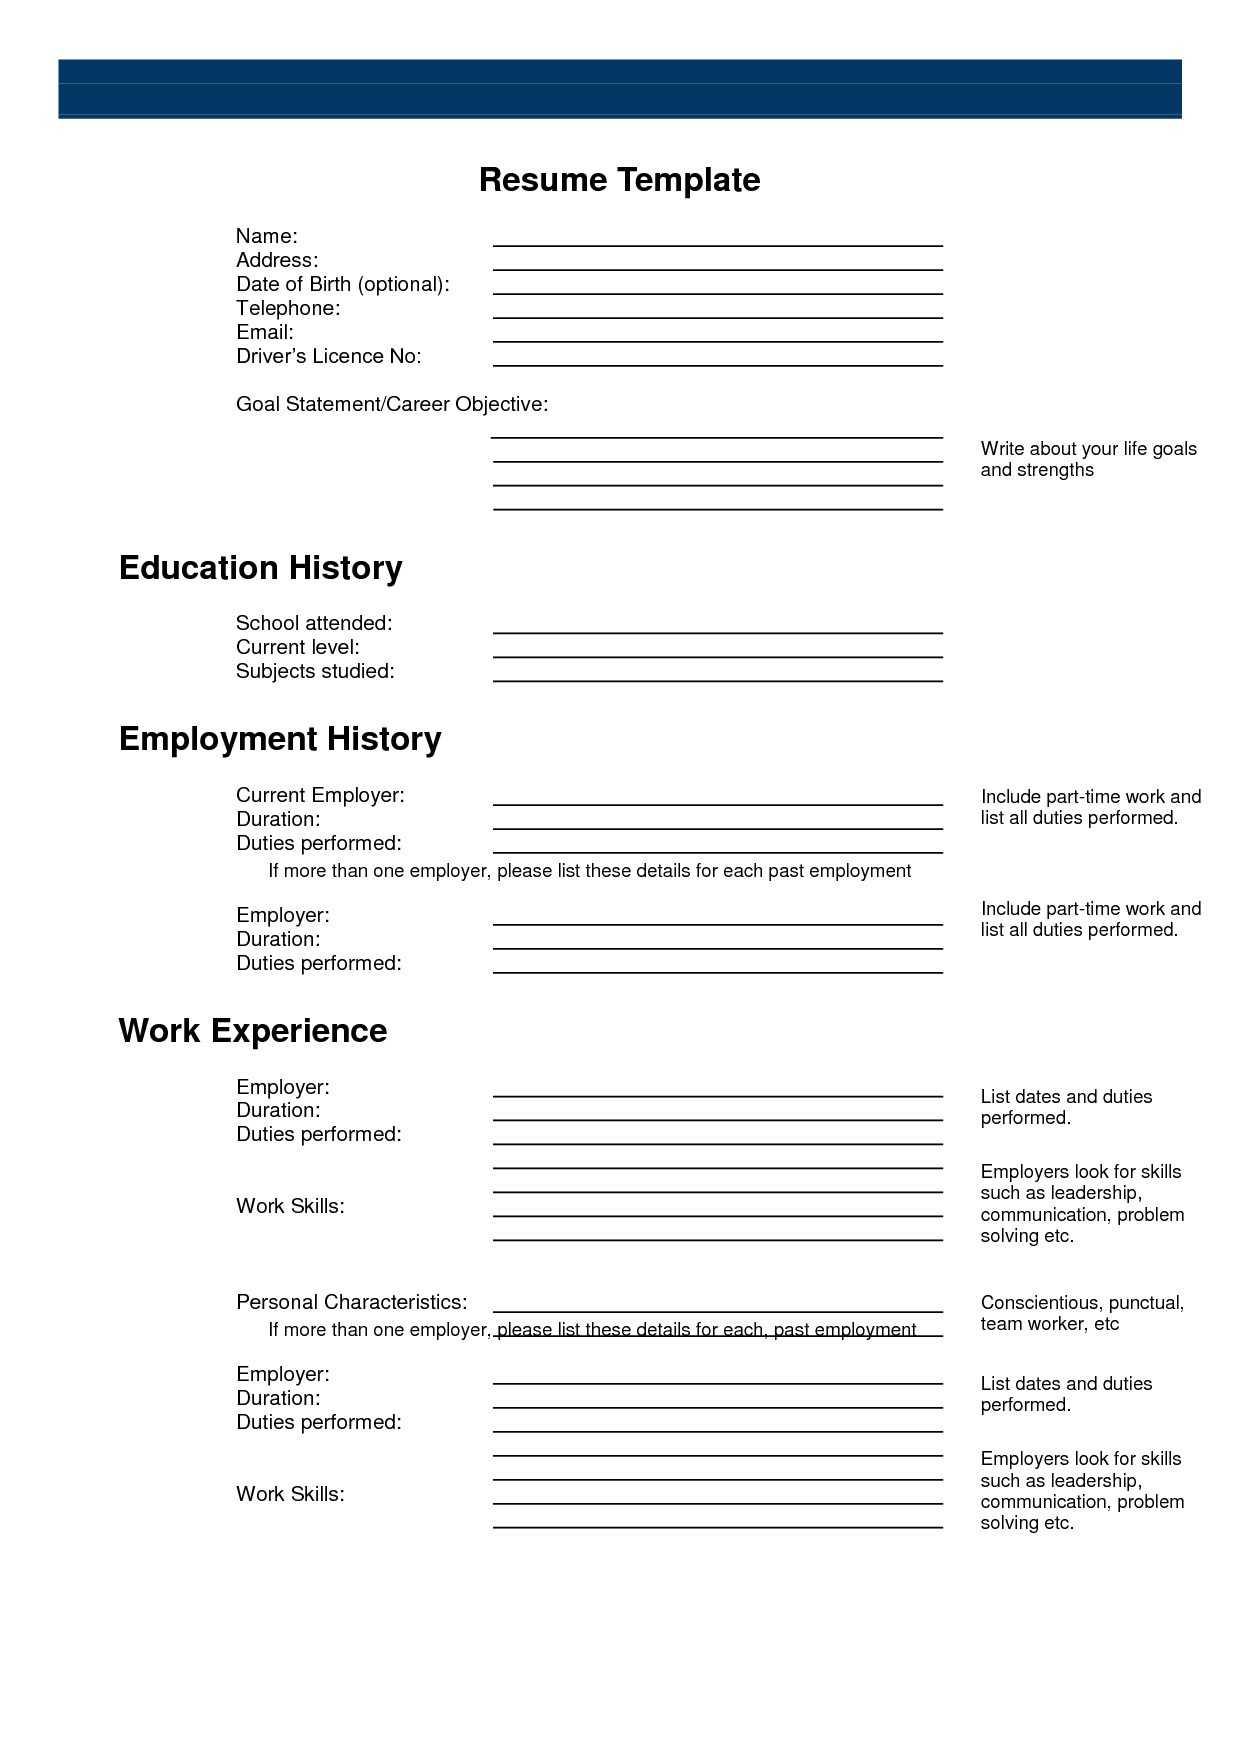 Fill In The Blank Resume Printable - Karan.ald2014 In Free Printable Resume Templates Microsoft Word